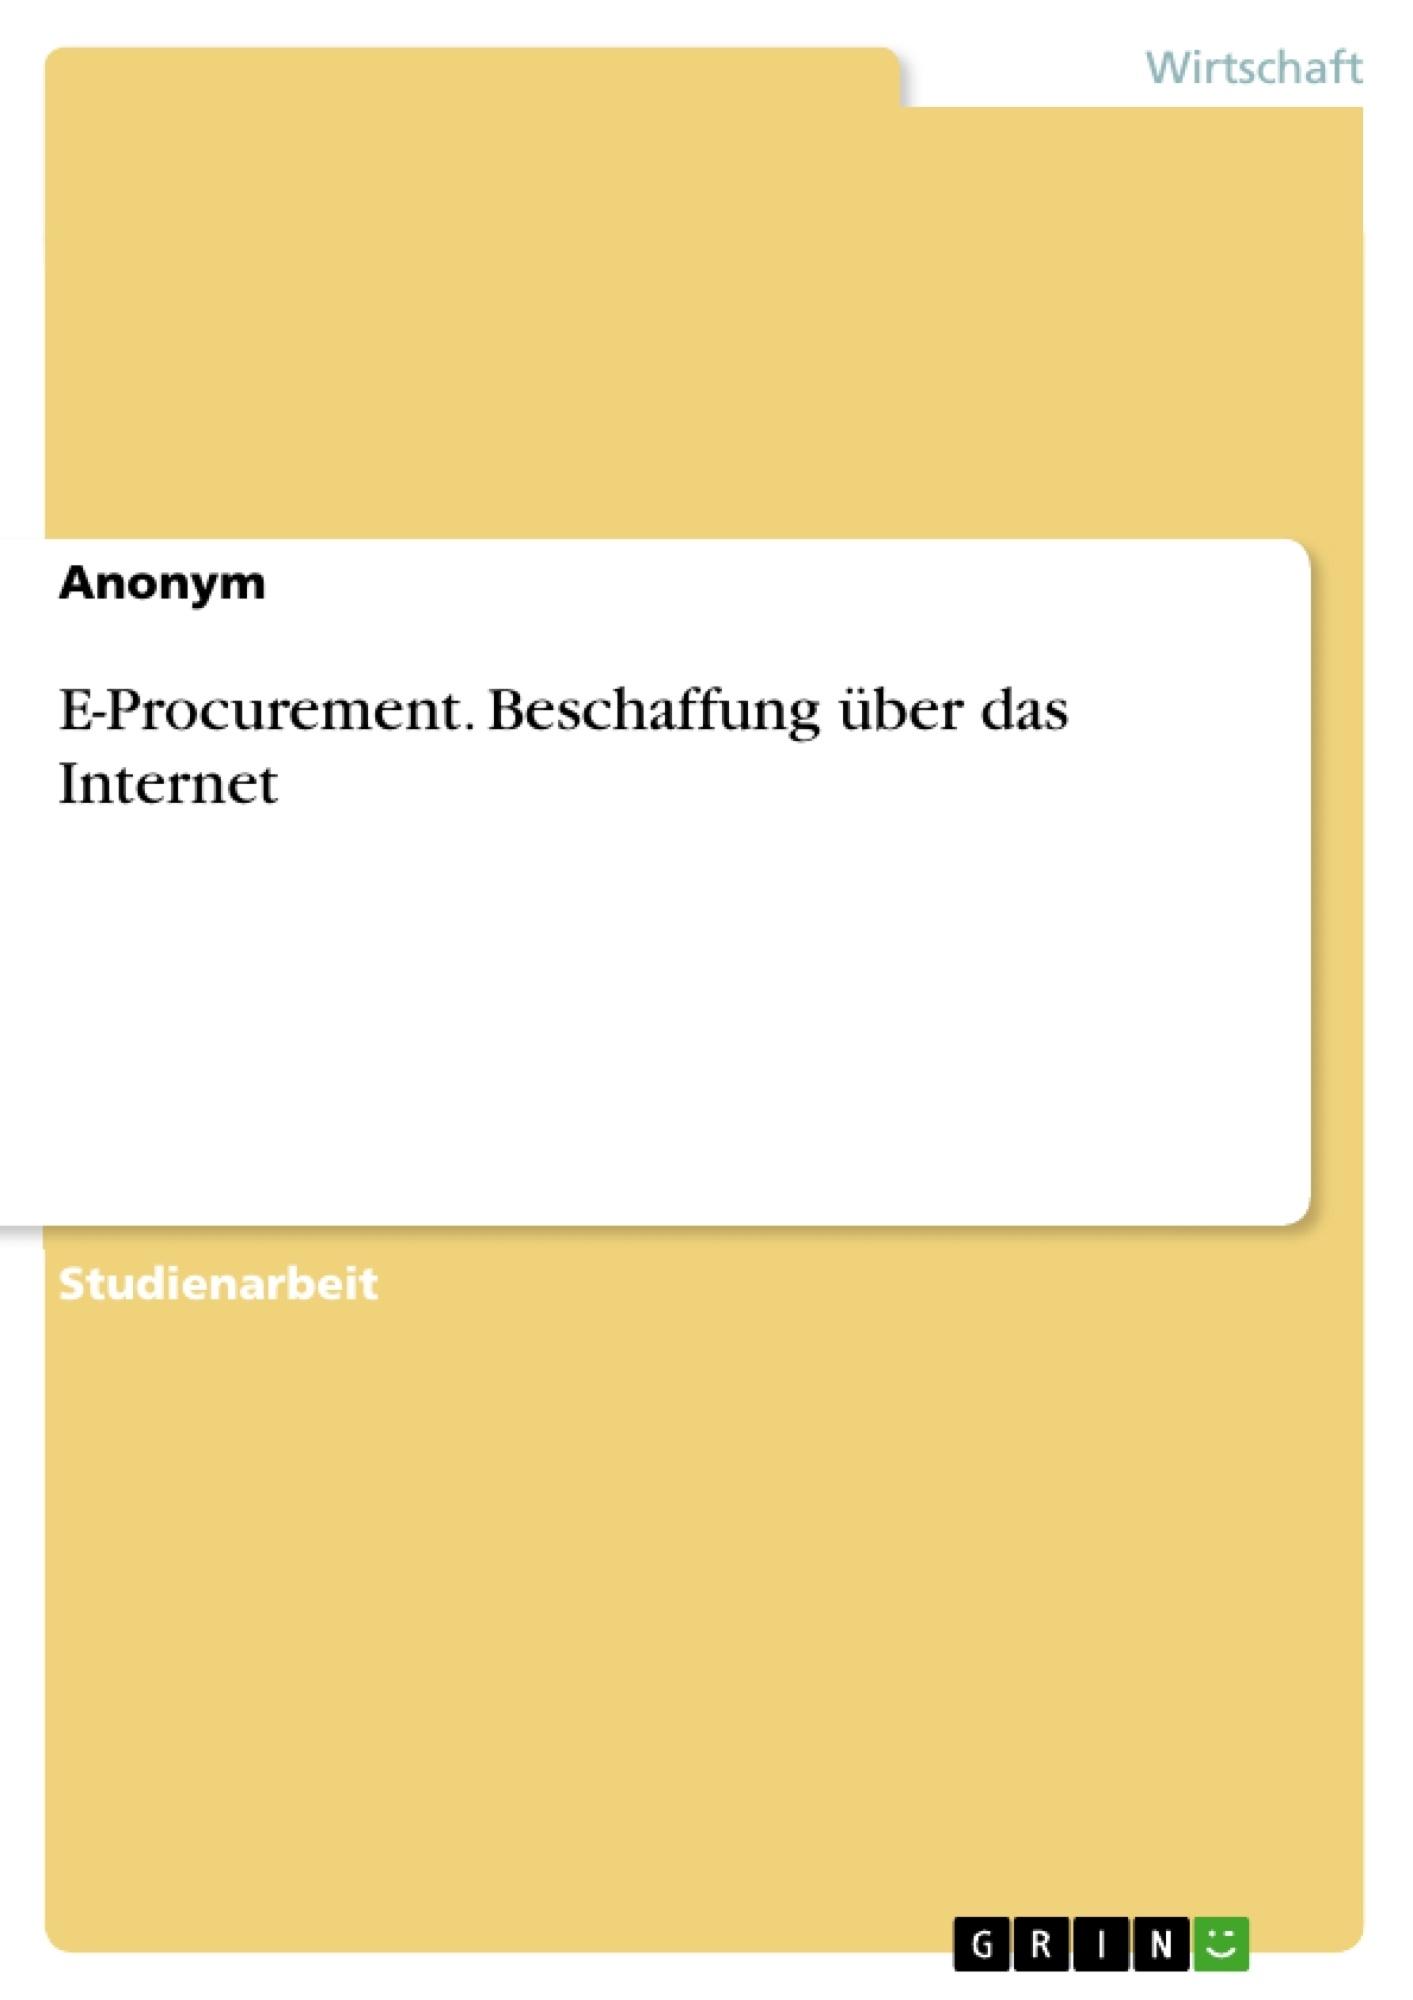 Titel: E-Procurement. Beschaffung über das Internet